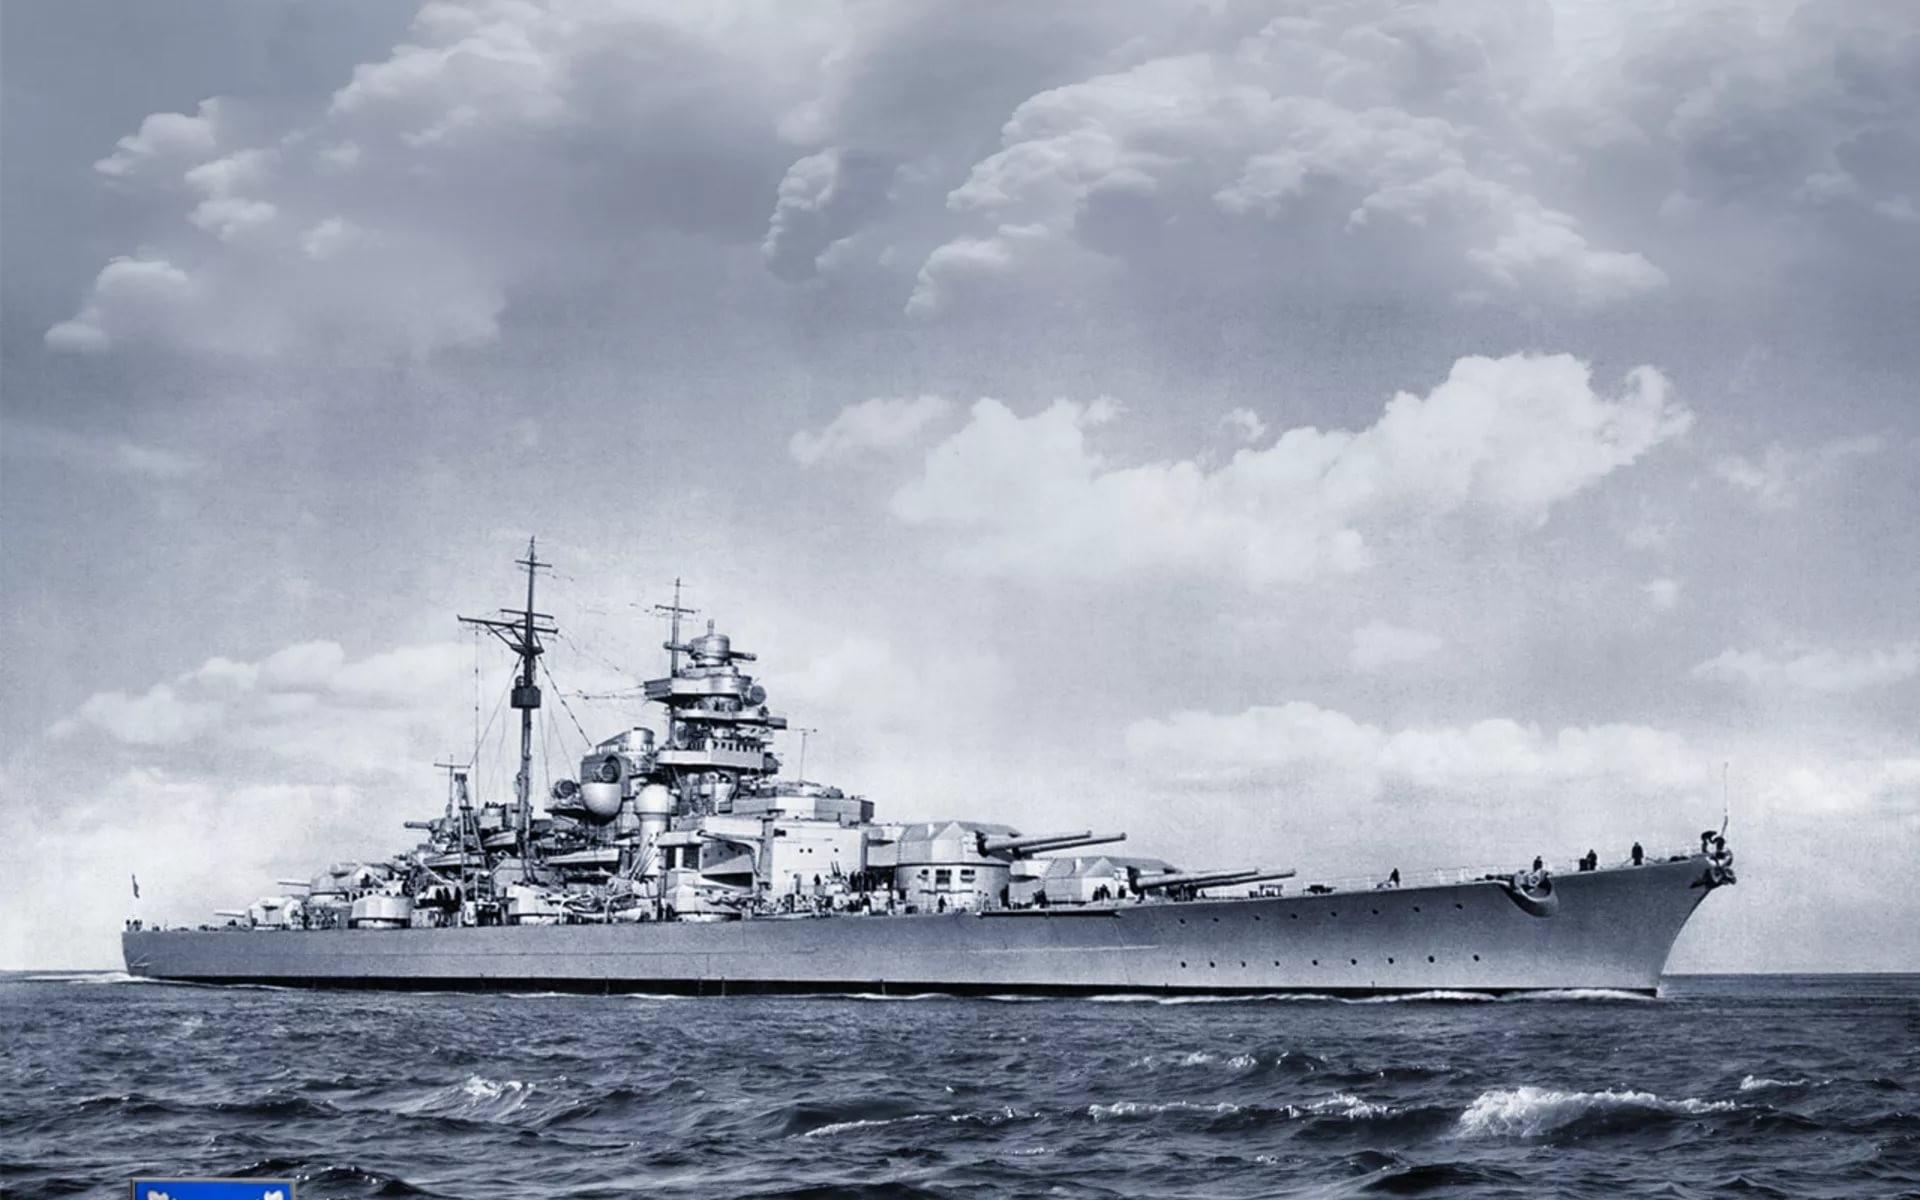 броненосец Бисмарк